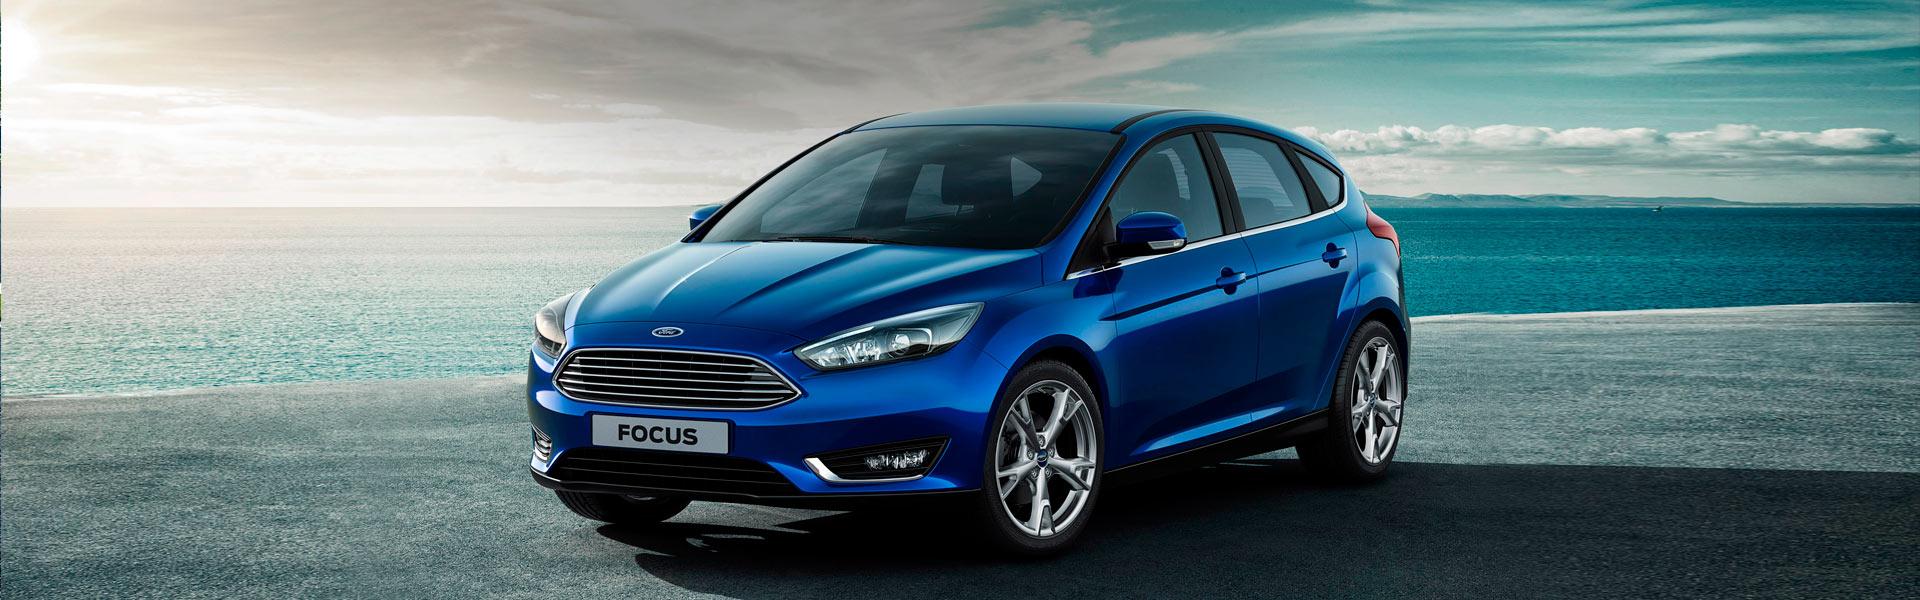 Наконечник рулевой тяги на Ford Focus